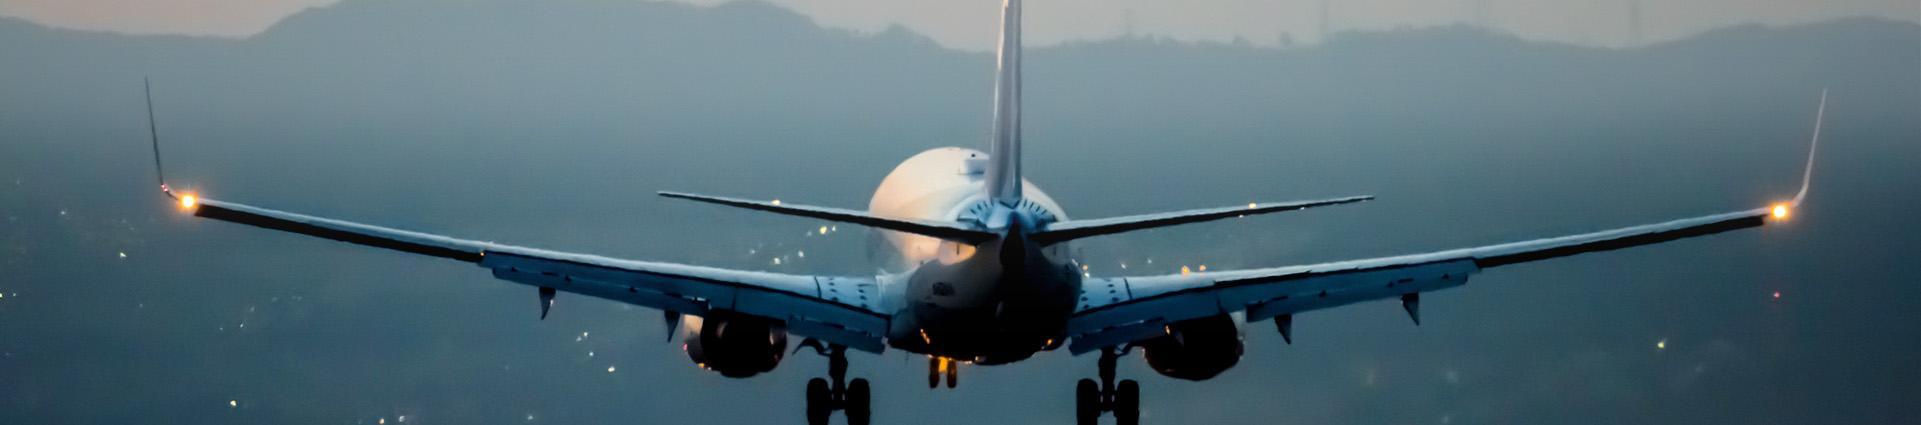 Samolot na niebieskim tle